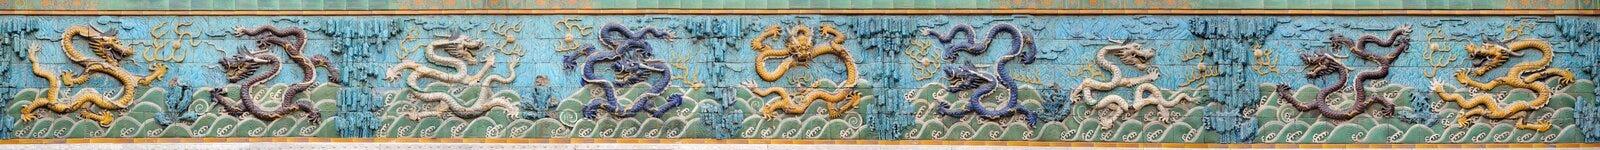 The Nine-Dragon Wall panorama. The Nine-Dragon Wall (Jiulongbi) in the Forbidden city of Beijing China stock image